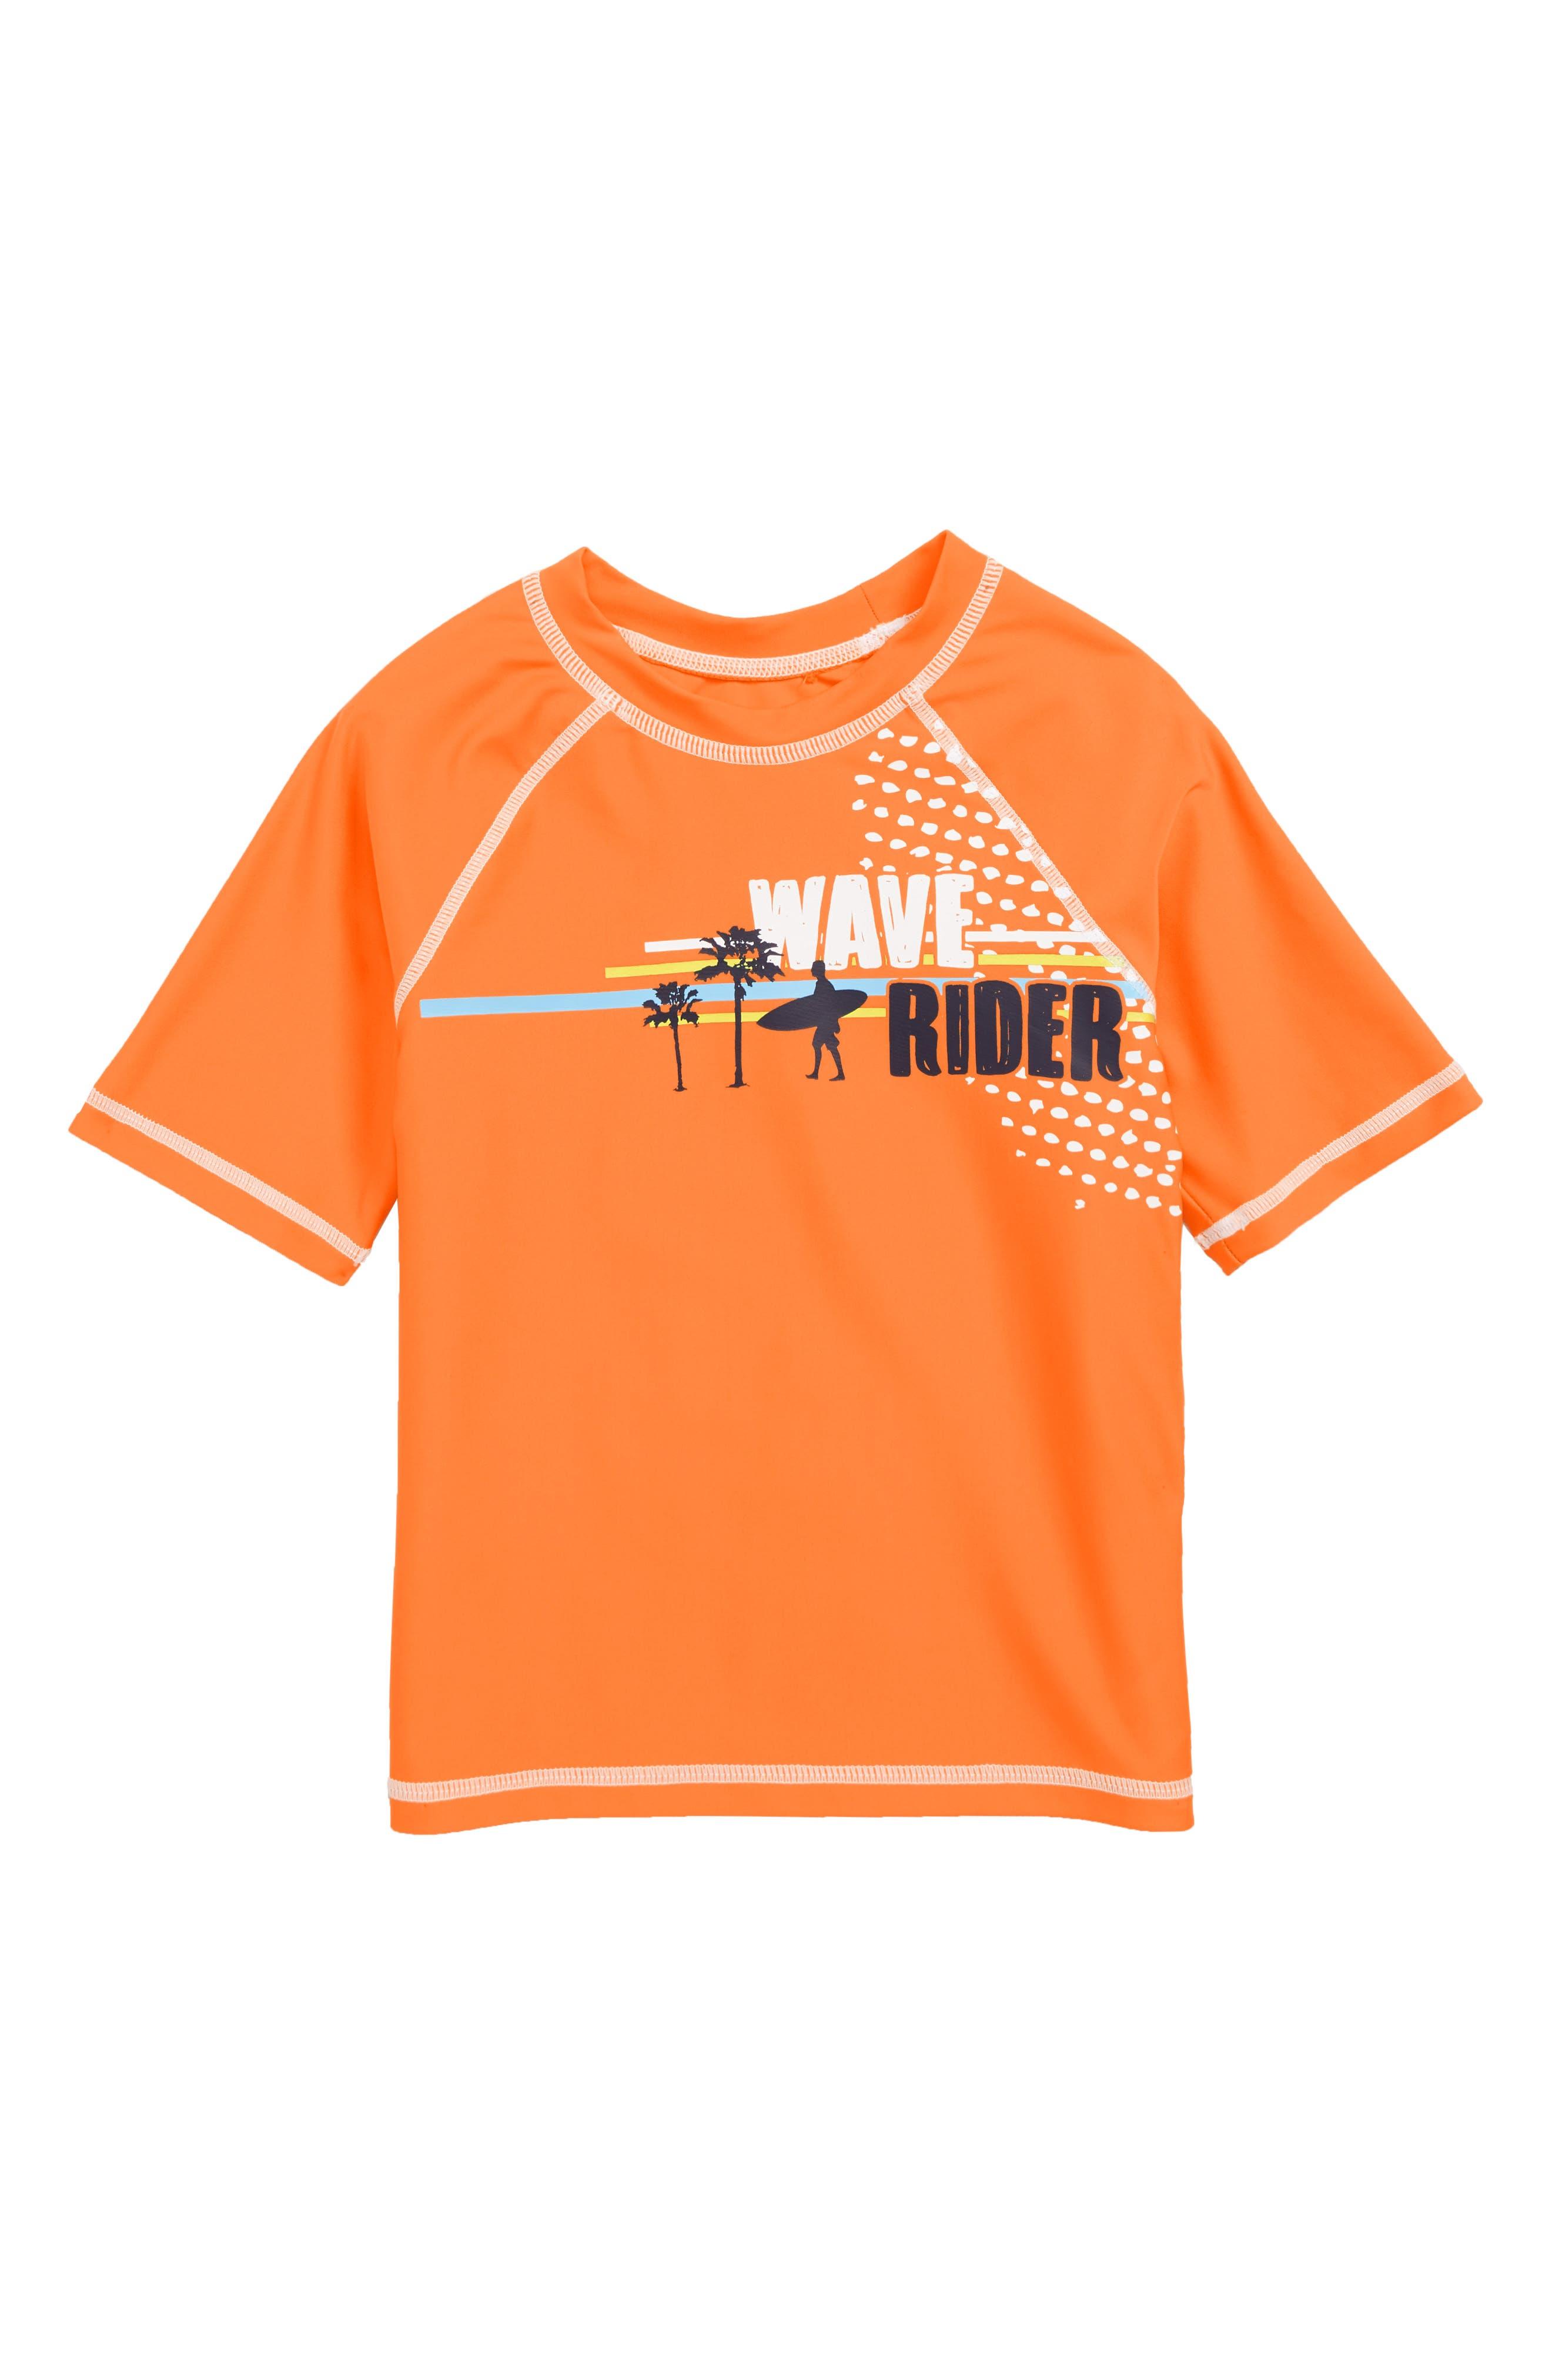 Toddler Boys Flapdoodles Wave Rider Rashguard Size 4T  Orange